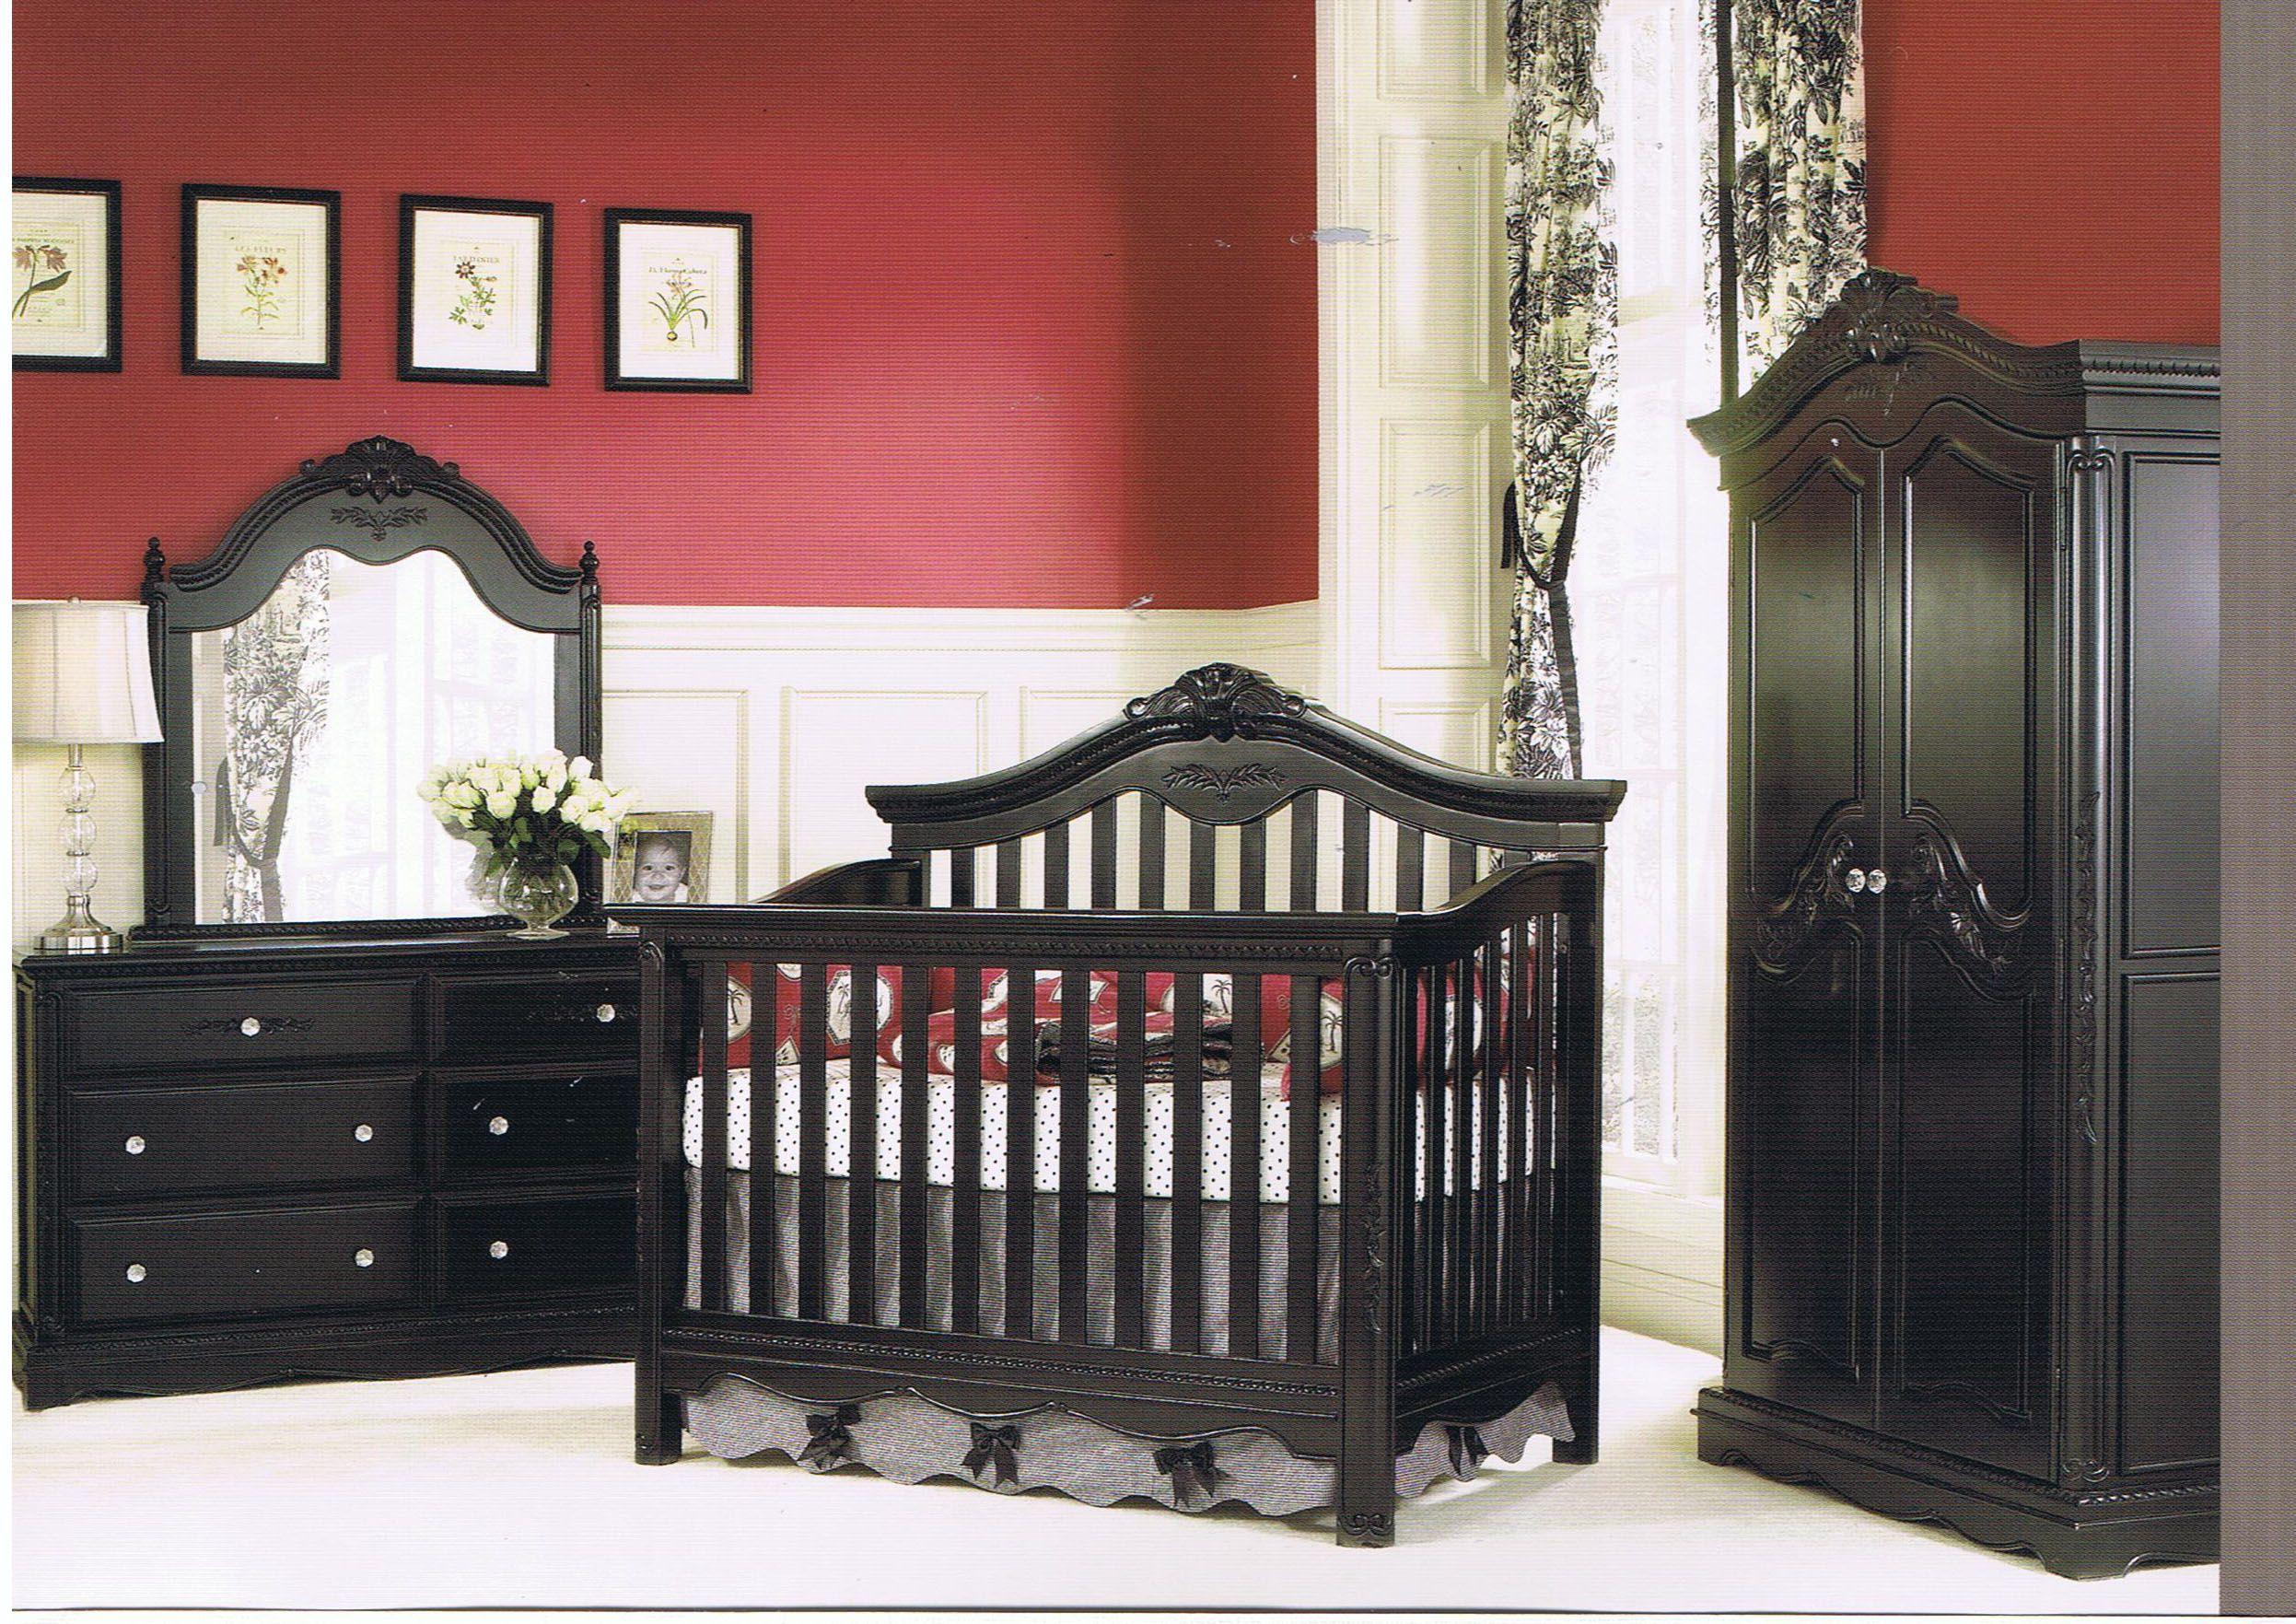 Munire Furniture Sale Starts Today! | Nursery furniture sets